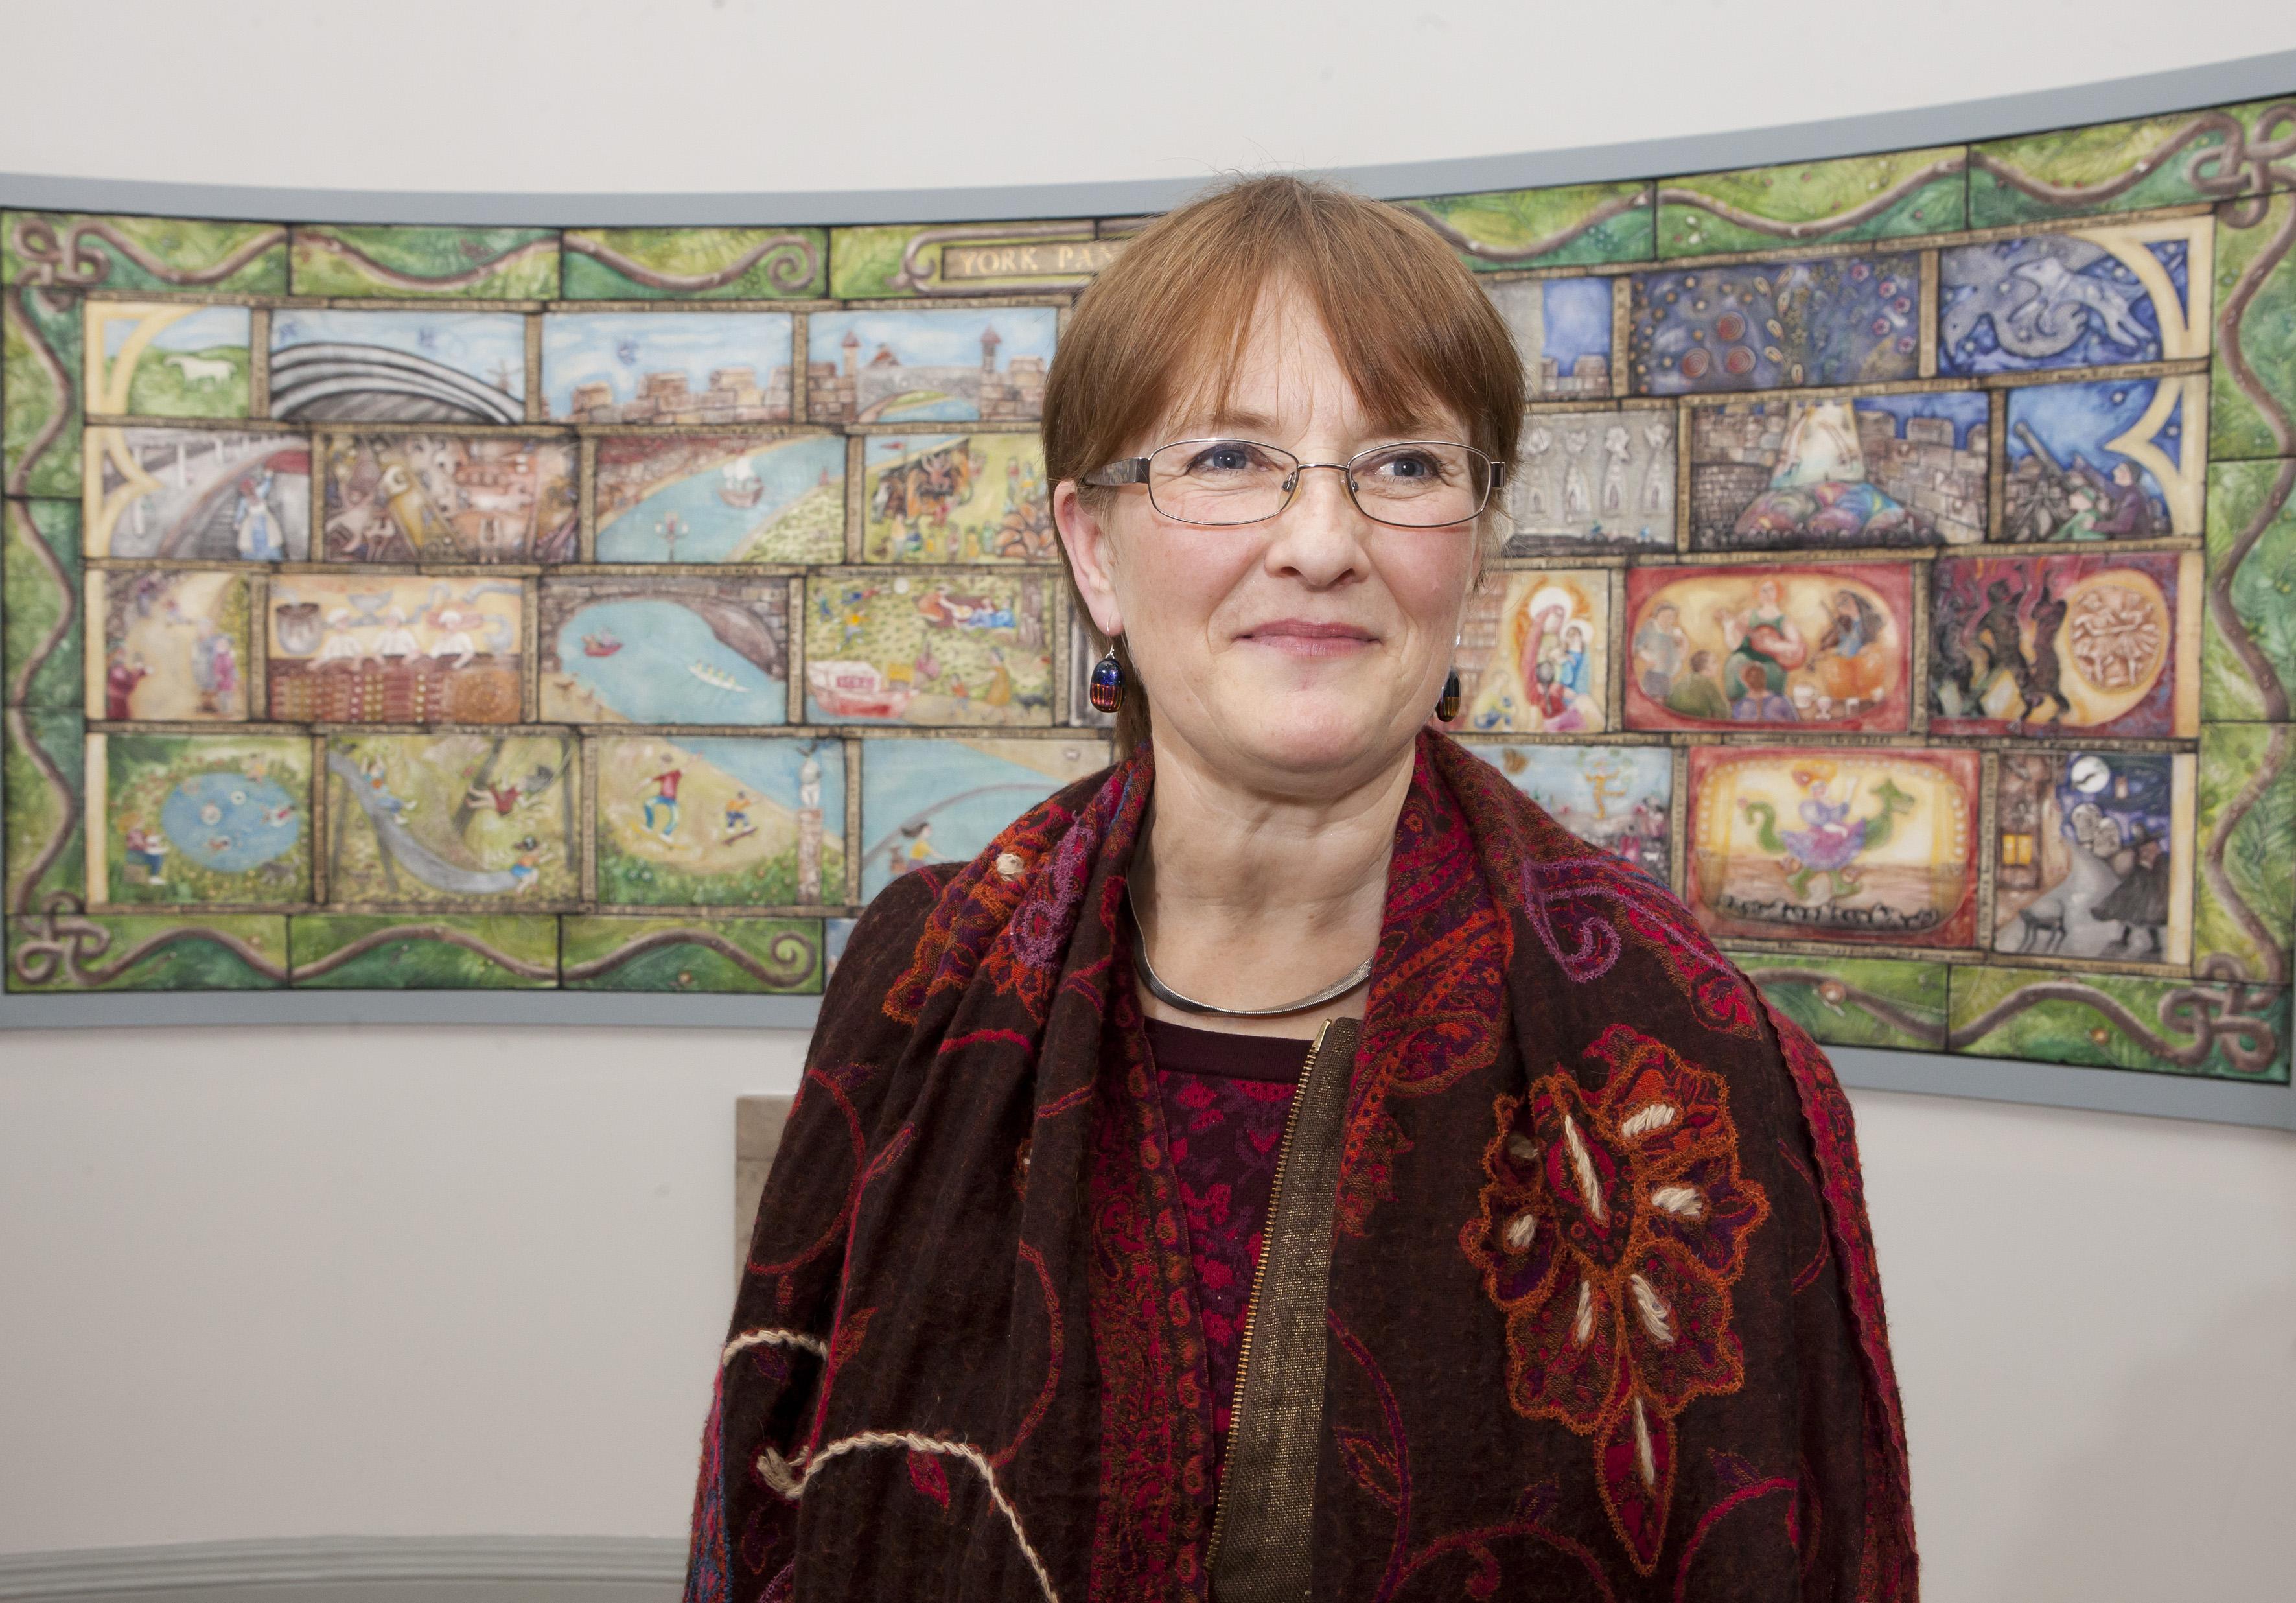 Panorama artist Emily Harvey